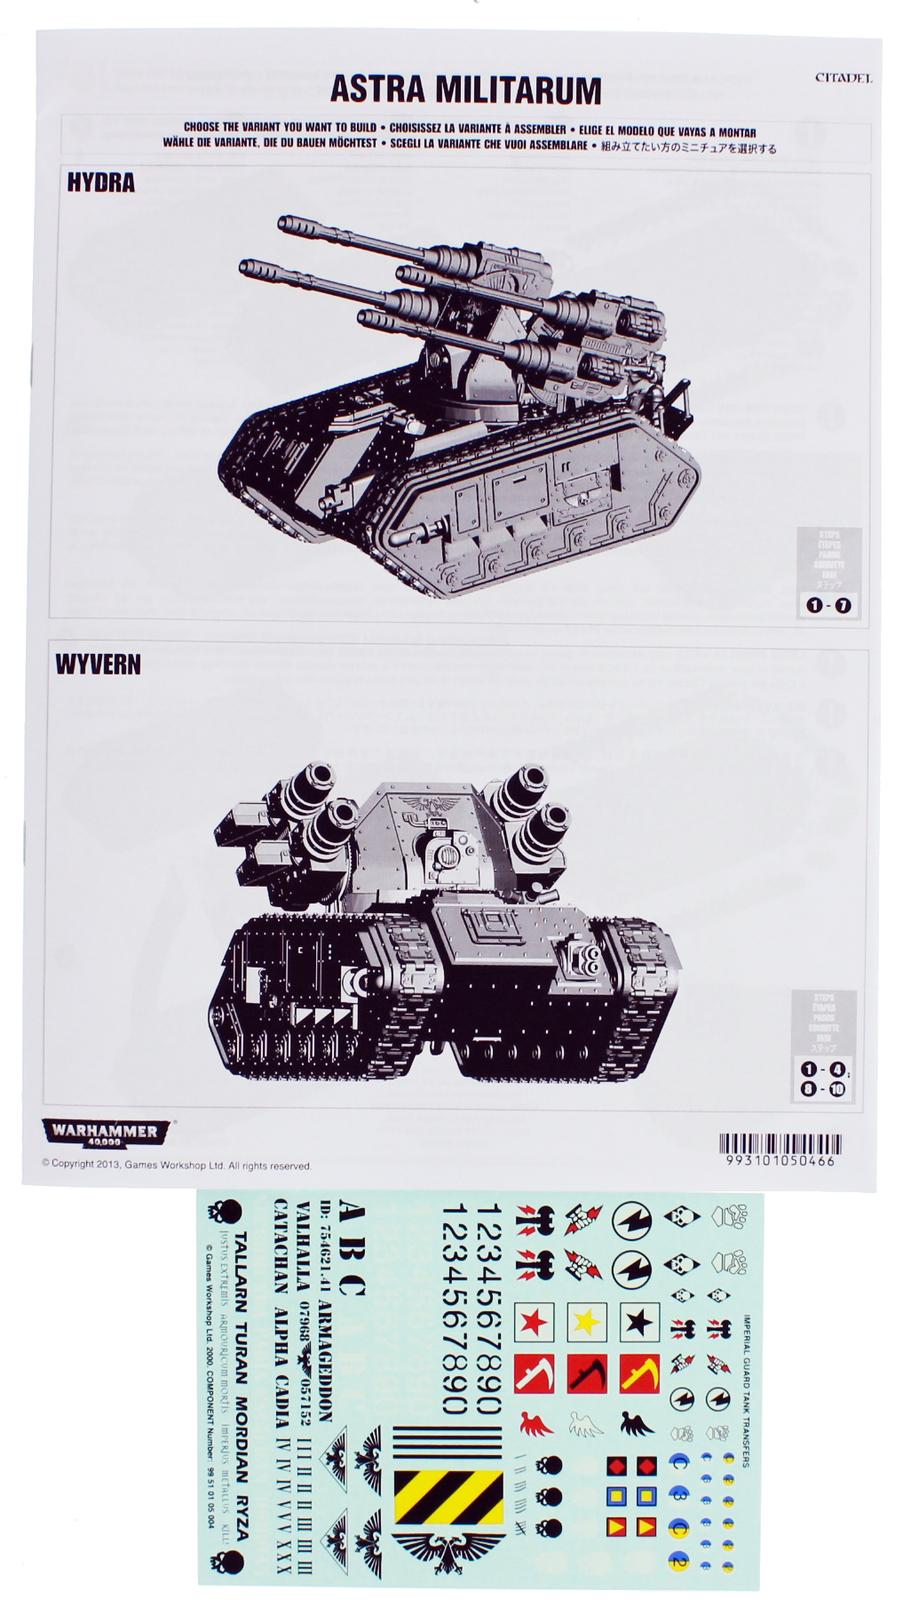 Astra Militarum Hydra/Wyvern image